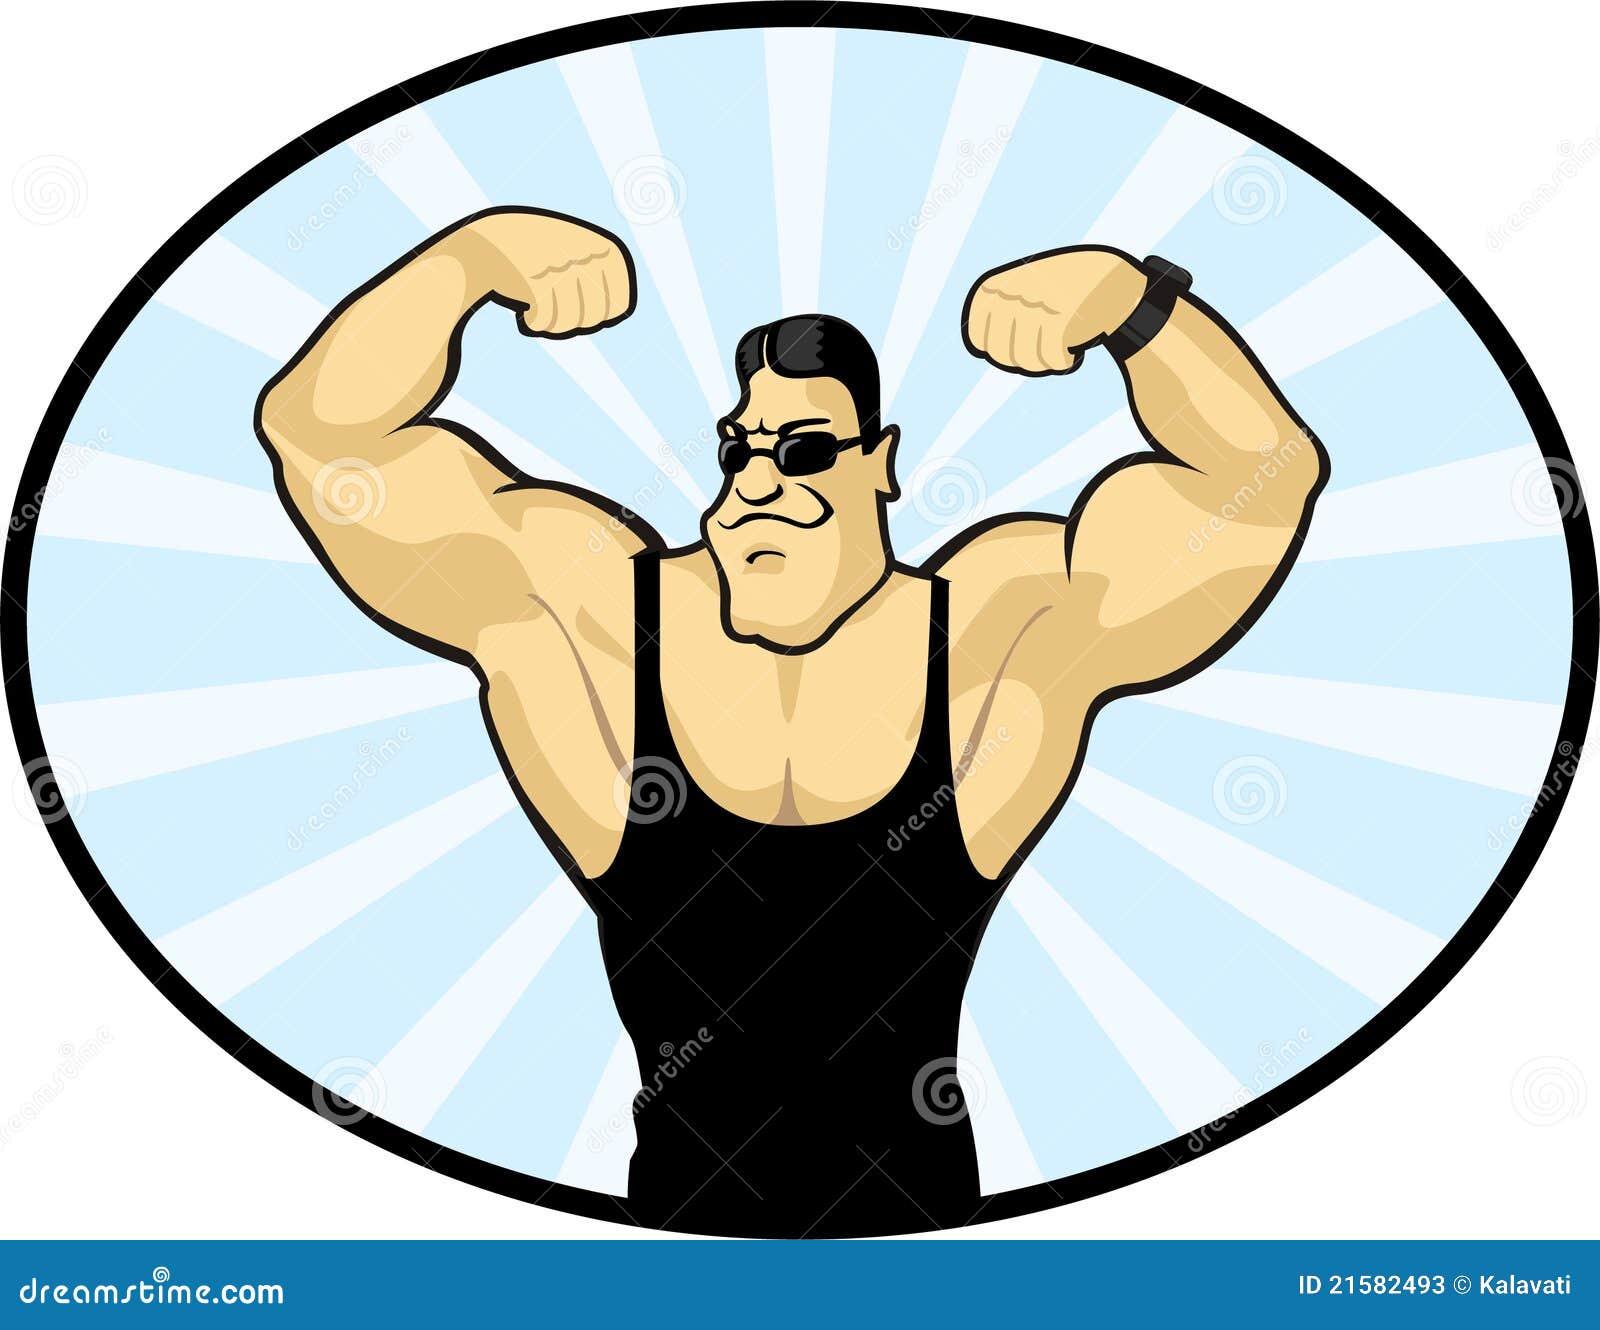 Vector Image Of A Bodybuilder Stock Vector - Image: 21582493